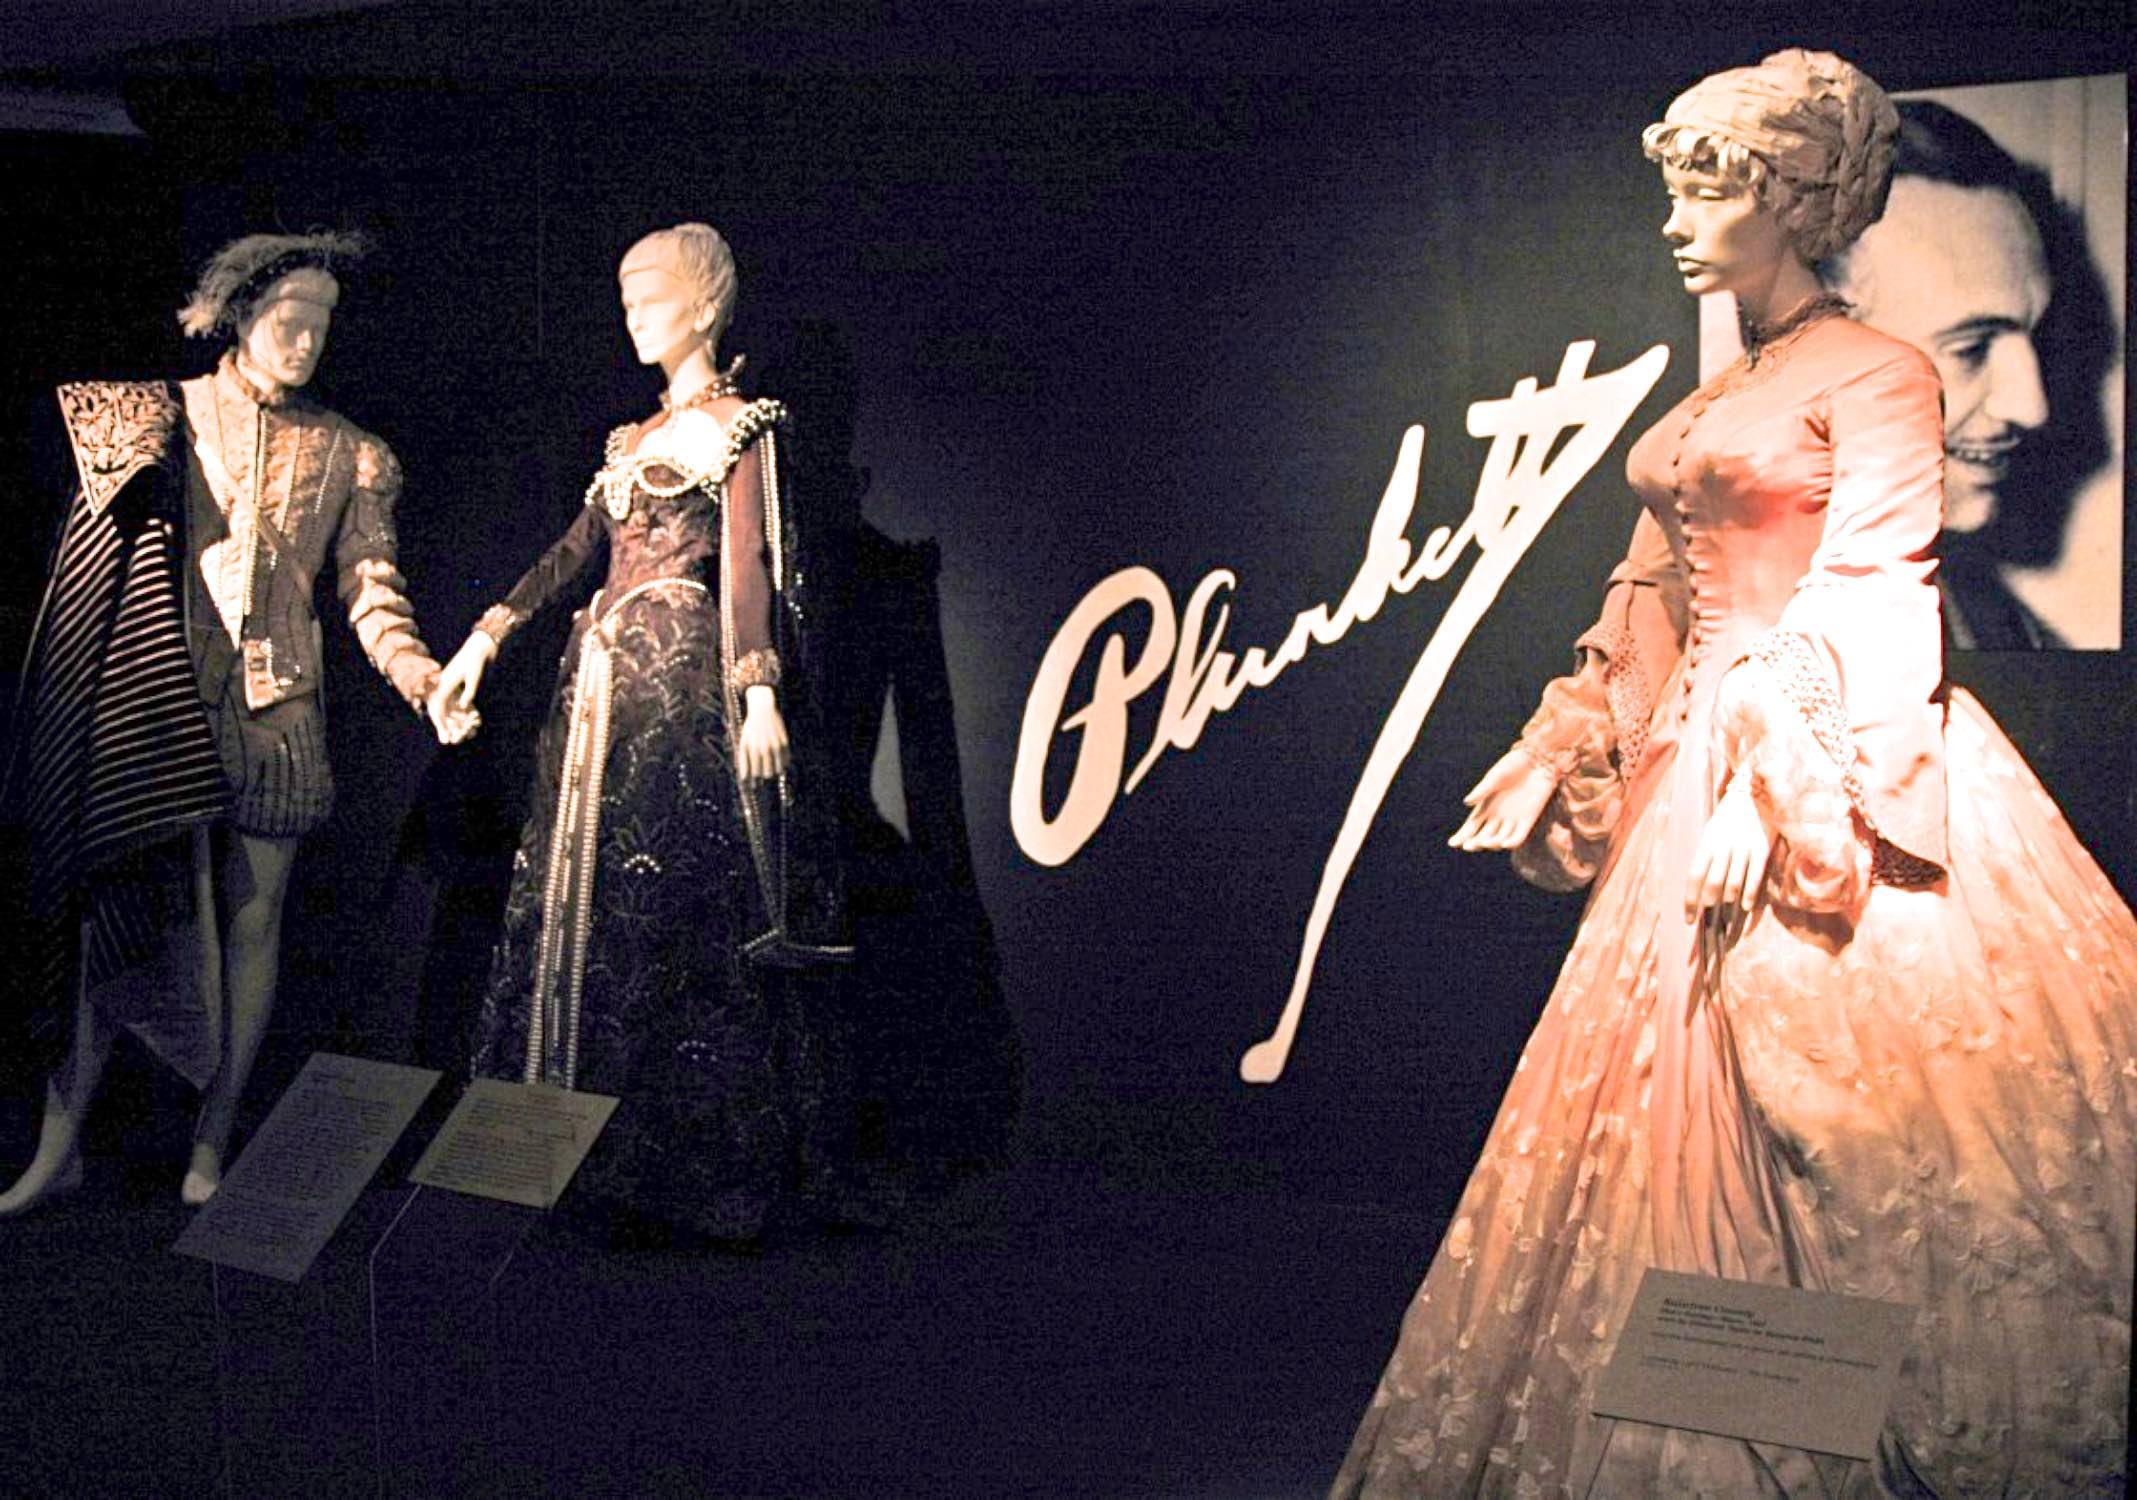 "Plunkett Exhibit: Fashion Institute of Design Merchandising – Los Angeles, CA October 31, 2003- July 15, 2004 Pieces shown in Photo: Roger Moore/ Lana Turner, ""Diane"", MGM, 1955, Designed by Walter Plunkett; Elizabeth Taylor, ""Raintree County, MGM, 1947, Designed by Walter Plunkett"